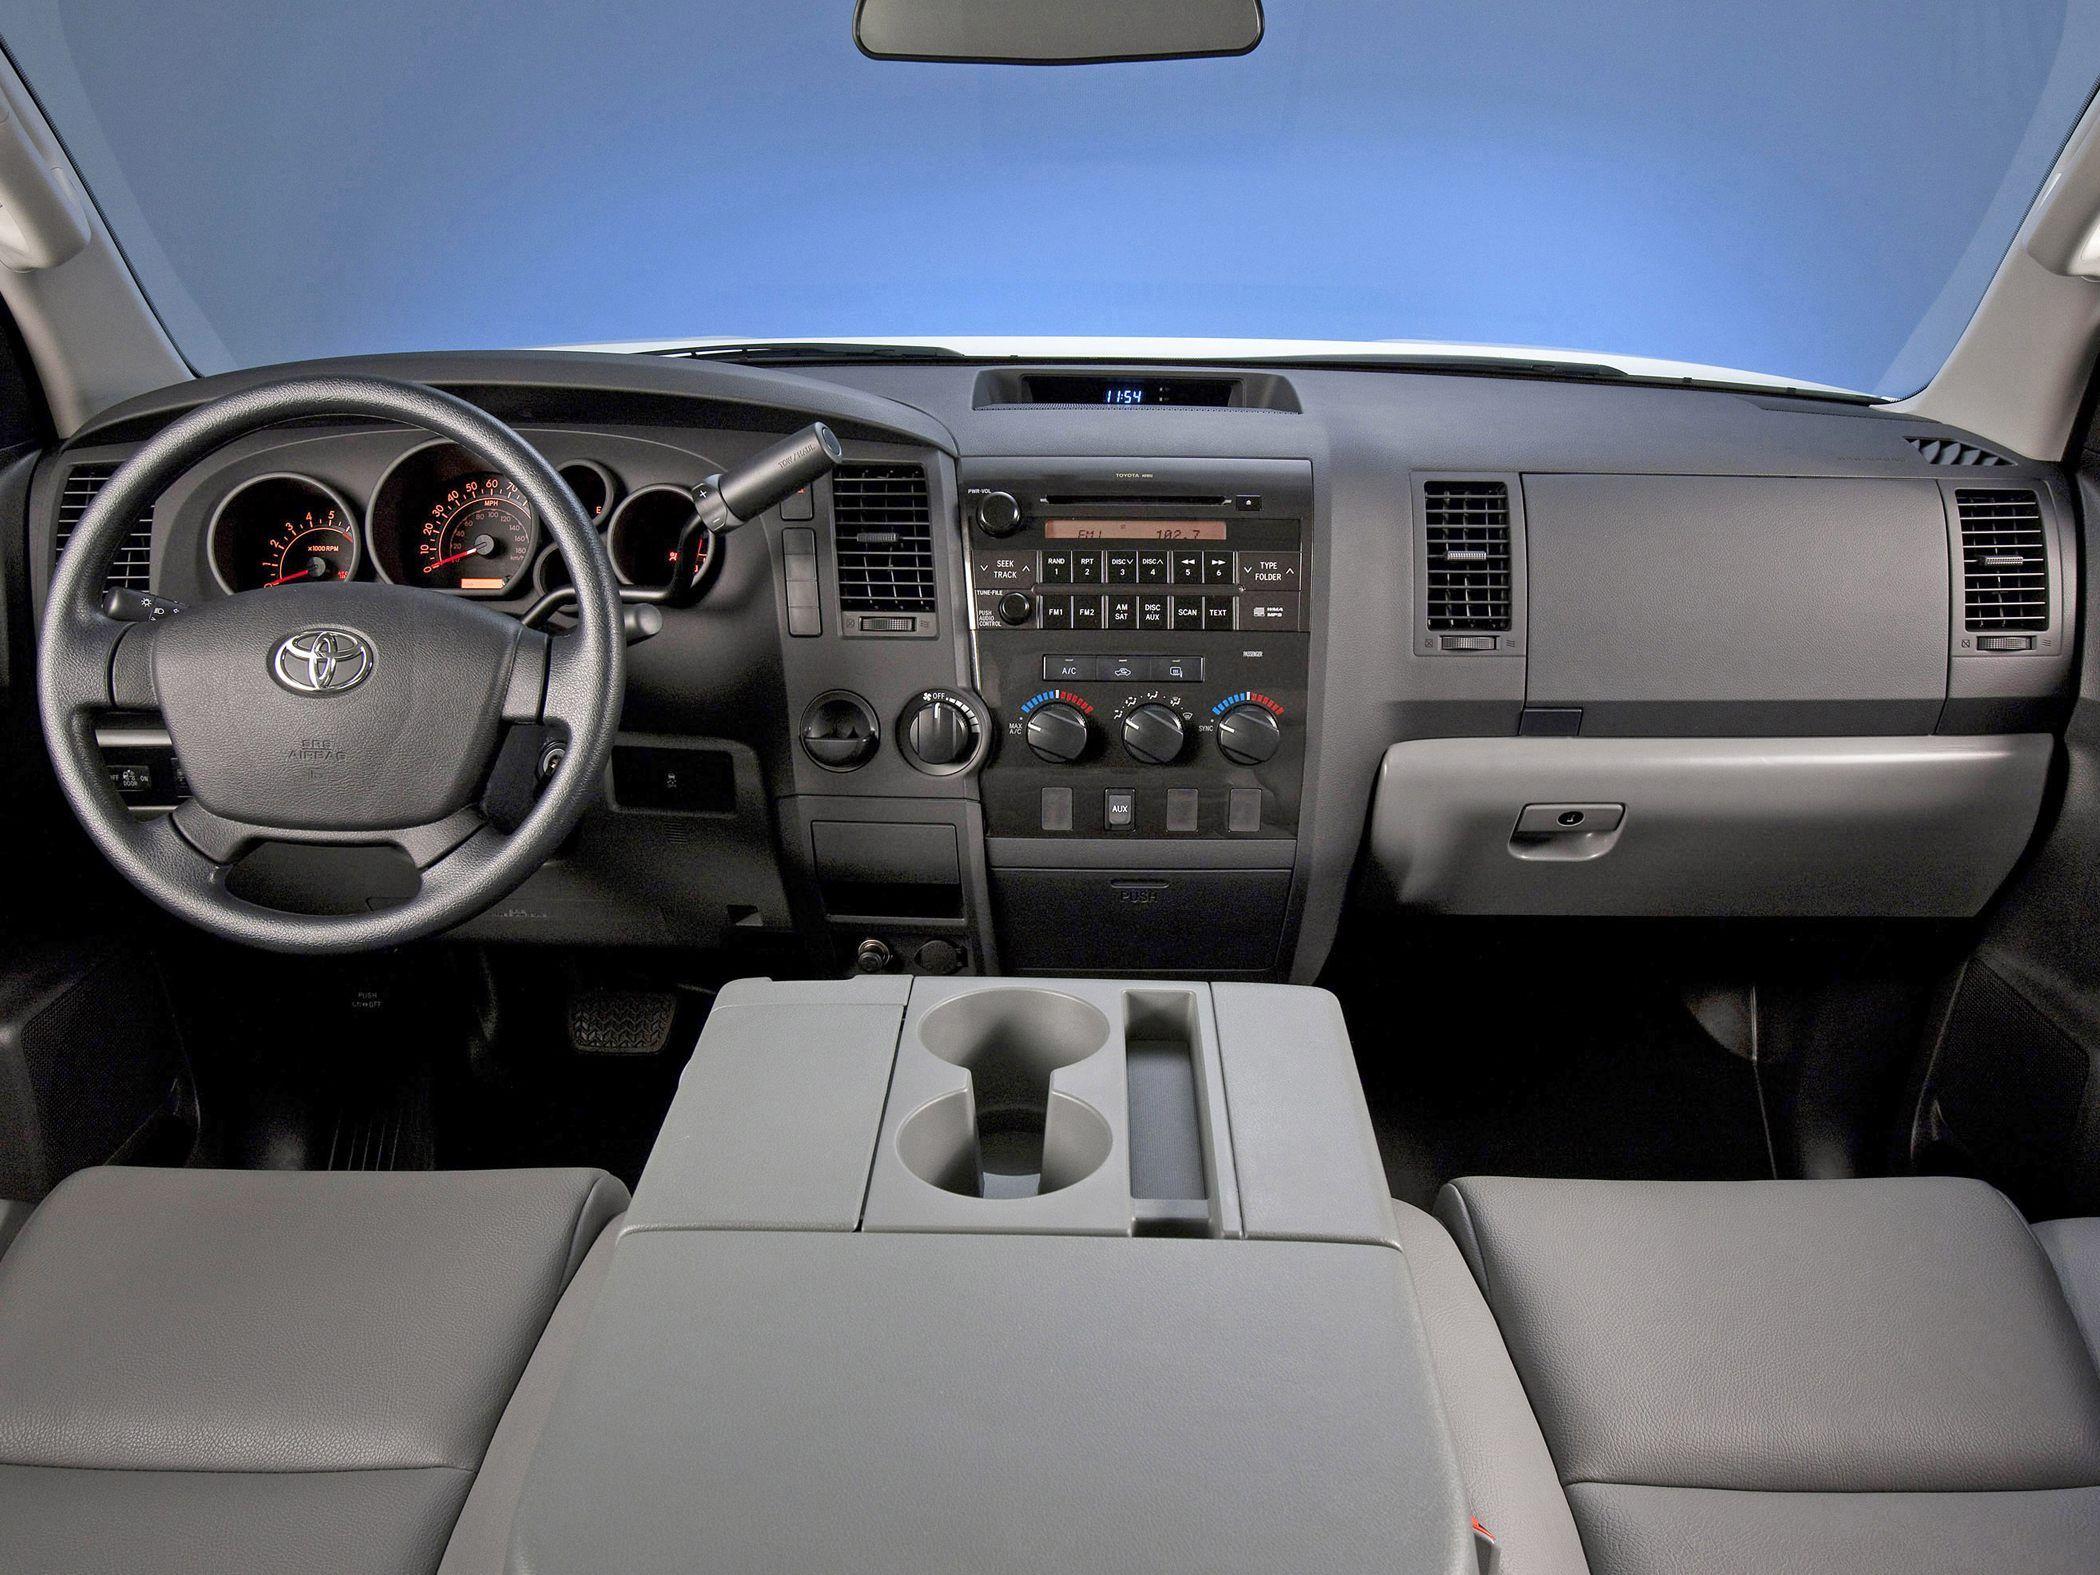 tundra min garage sscluxuryautomobile platinum interior toyota